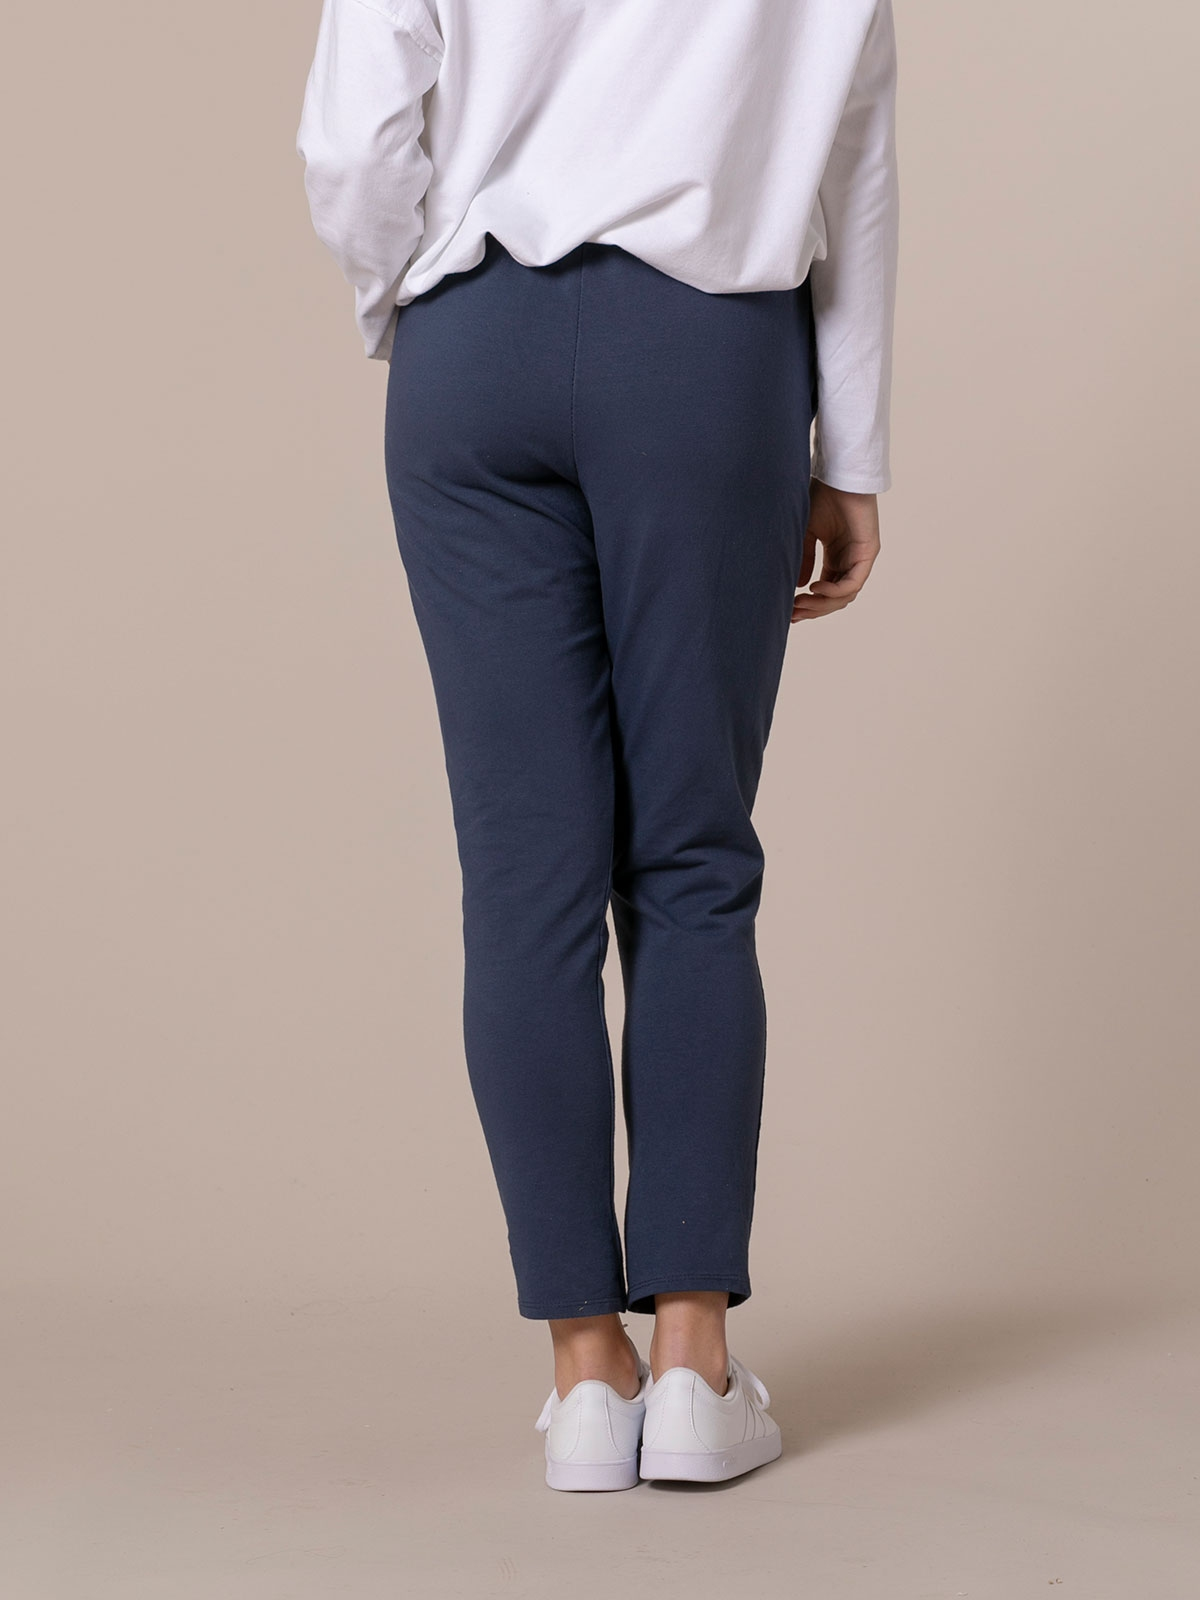 Pantalón mujer sport felpa Azul Marino